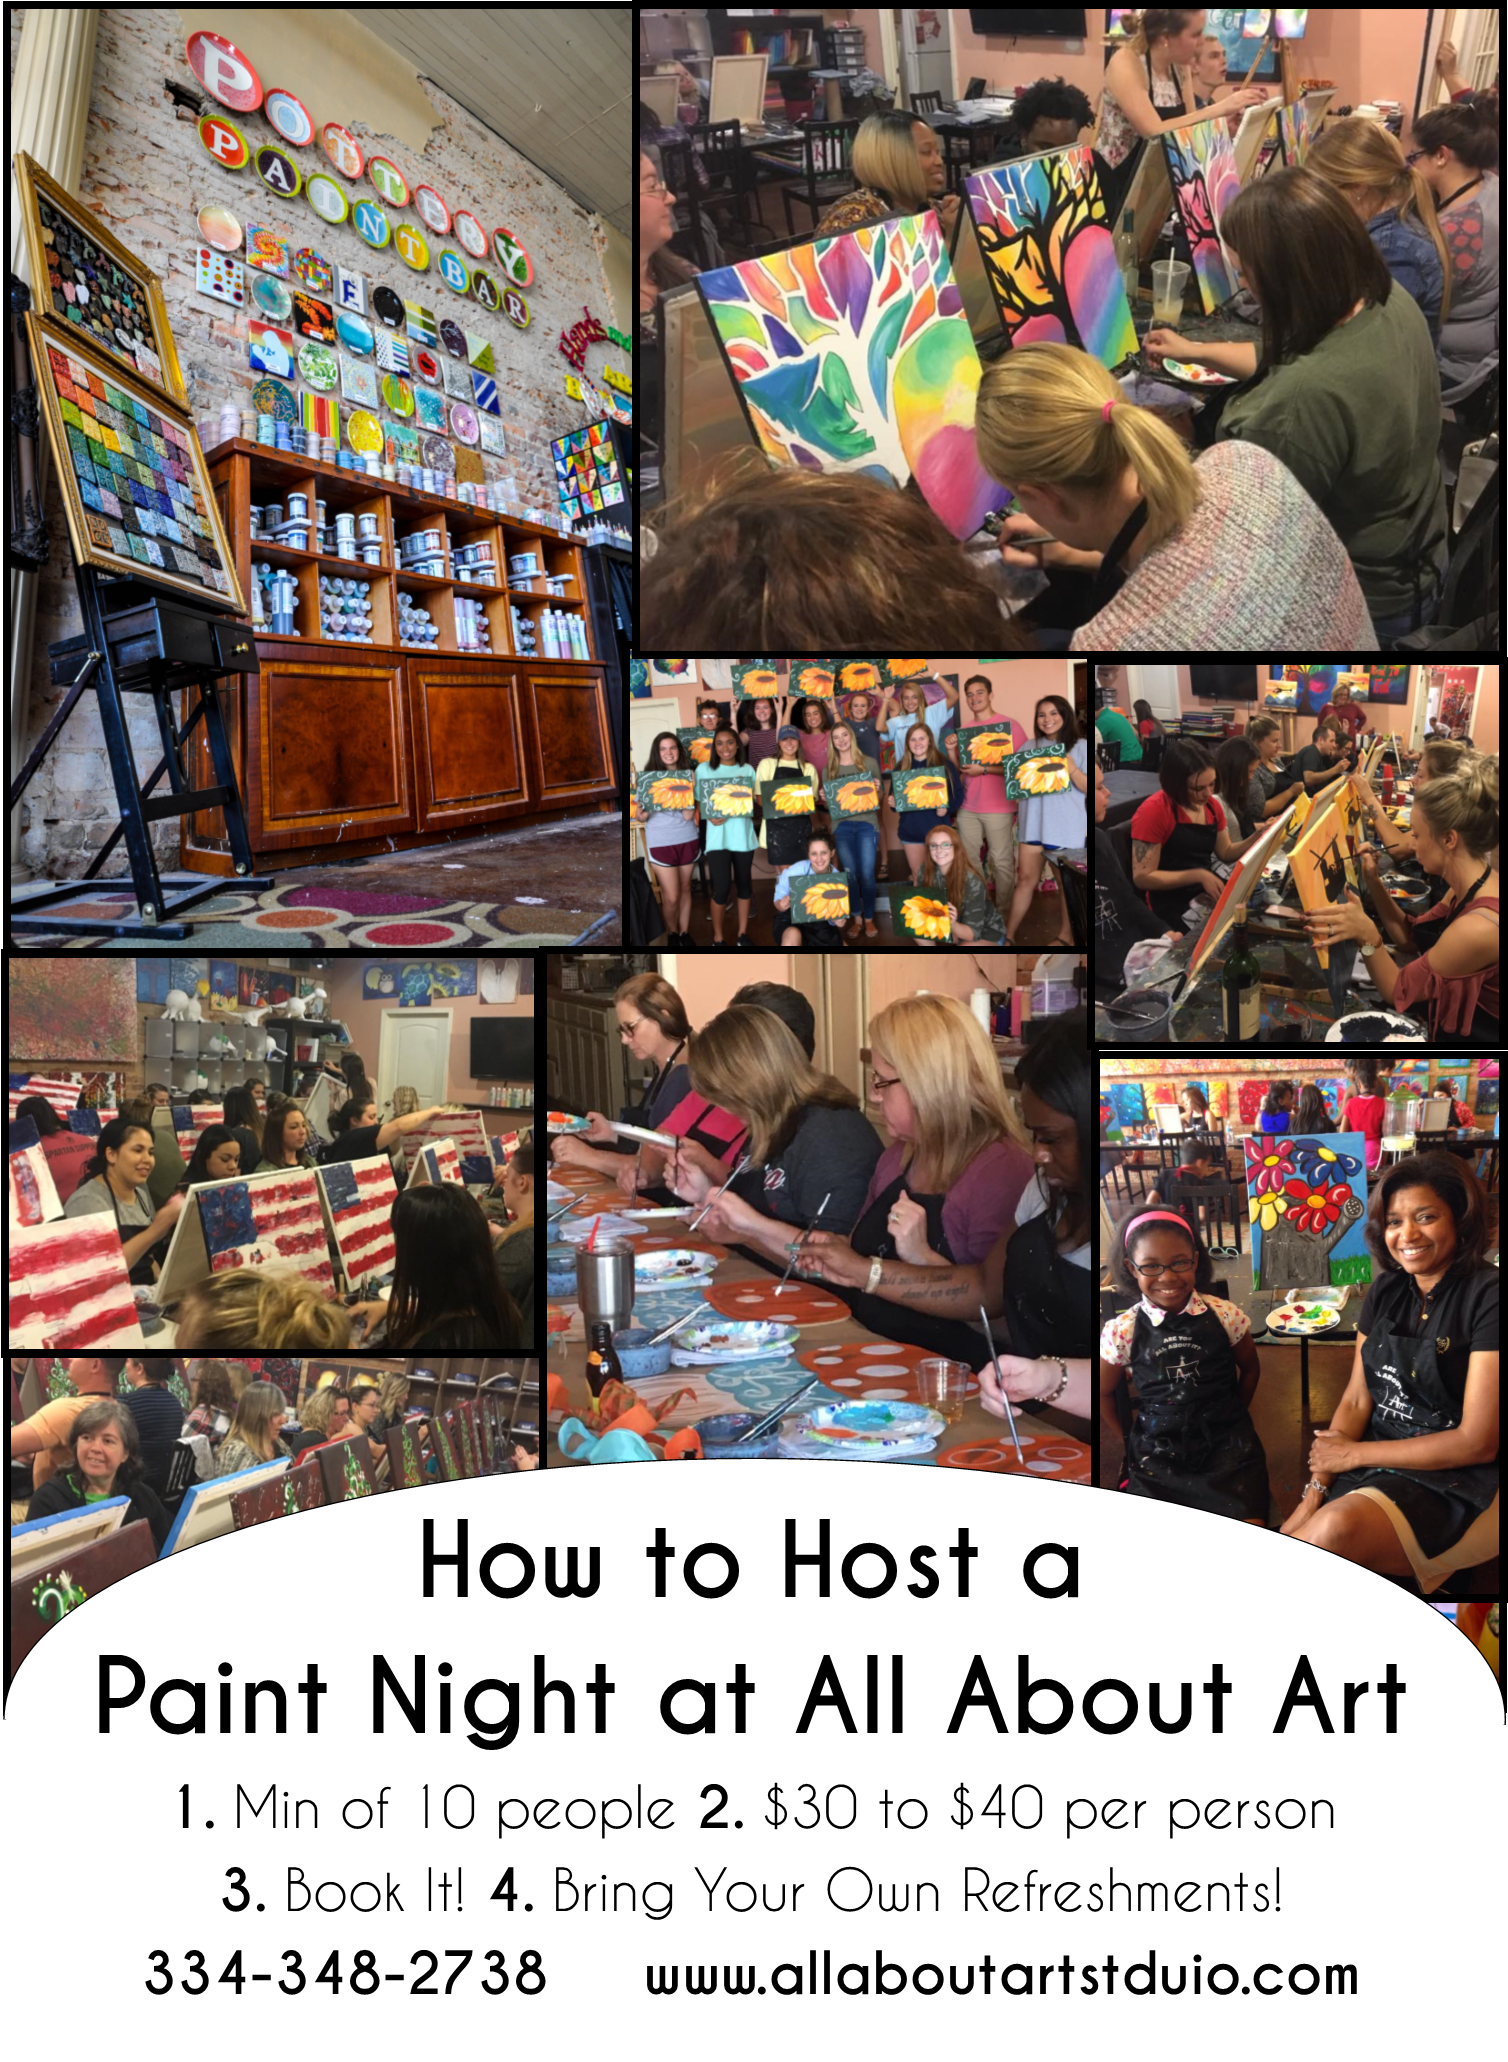 All About Art Studio, PYOP Paint And Sip Enterprise